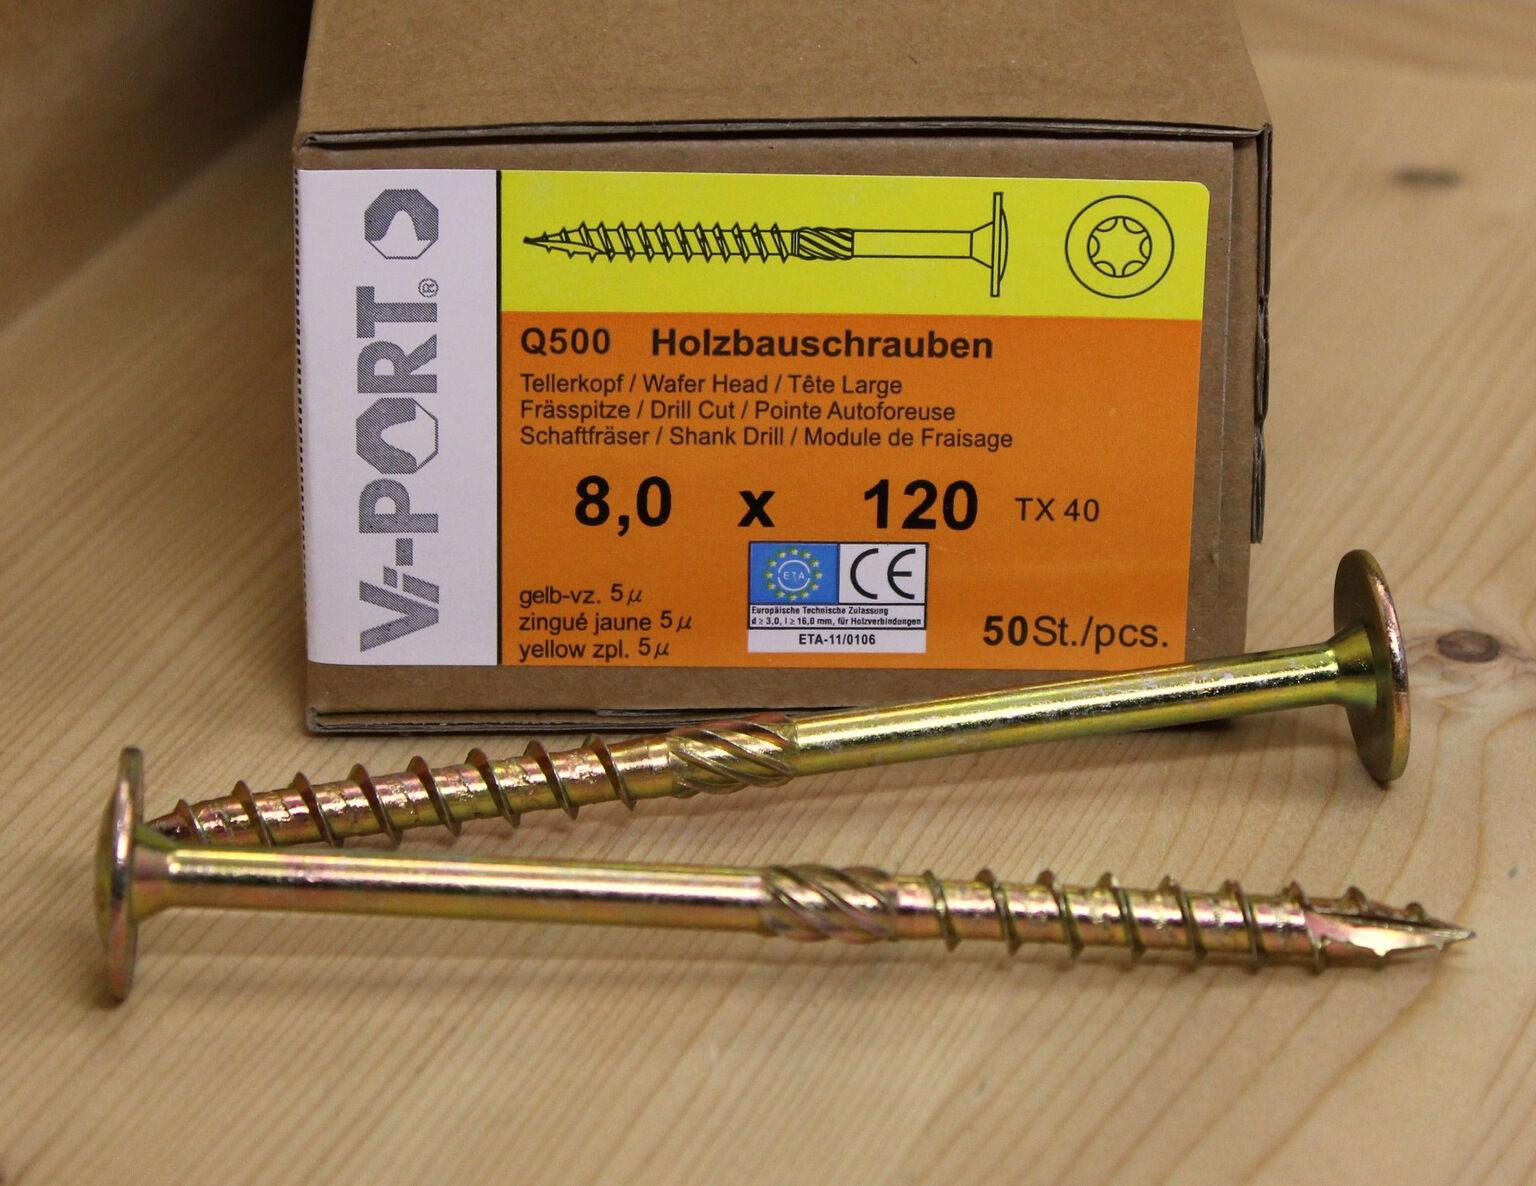 8 mm Vi-PORT® Tellerkopfschrauben EU-Zulassung Holzbauschrauben Tellerkopf TX40